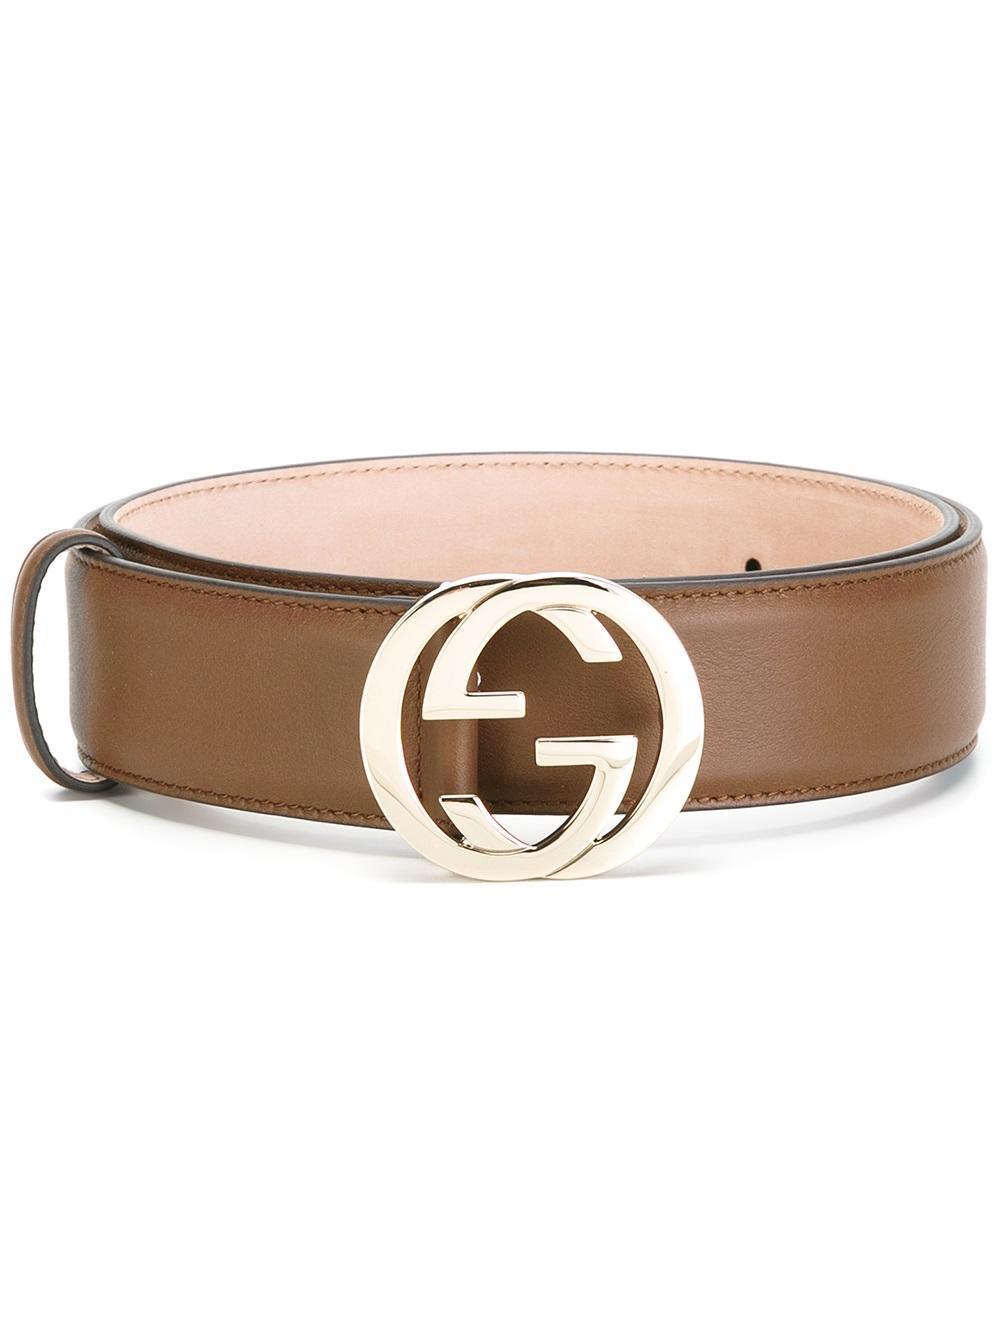 gucci gg buckle belt in brown lyst